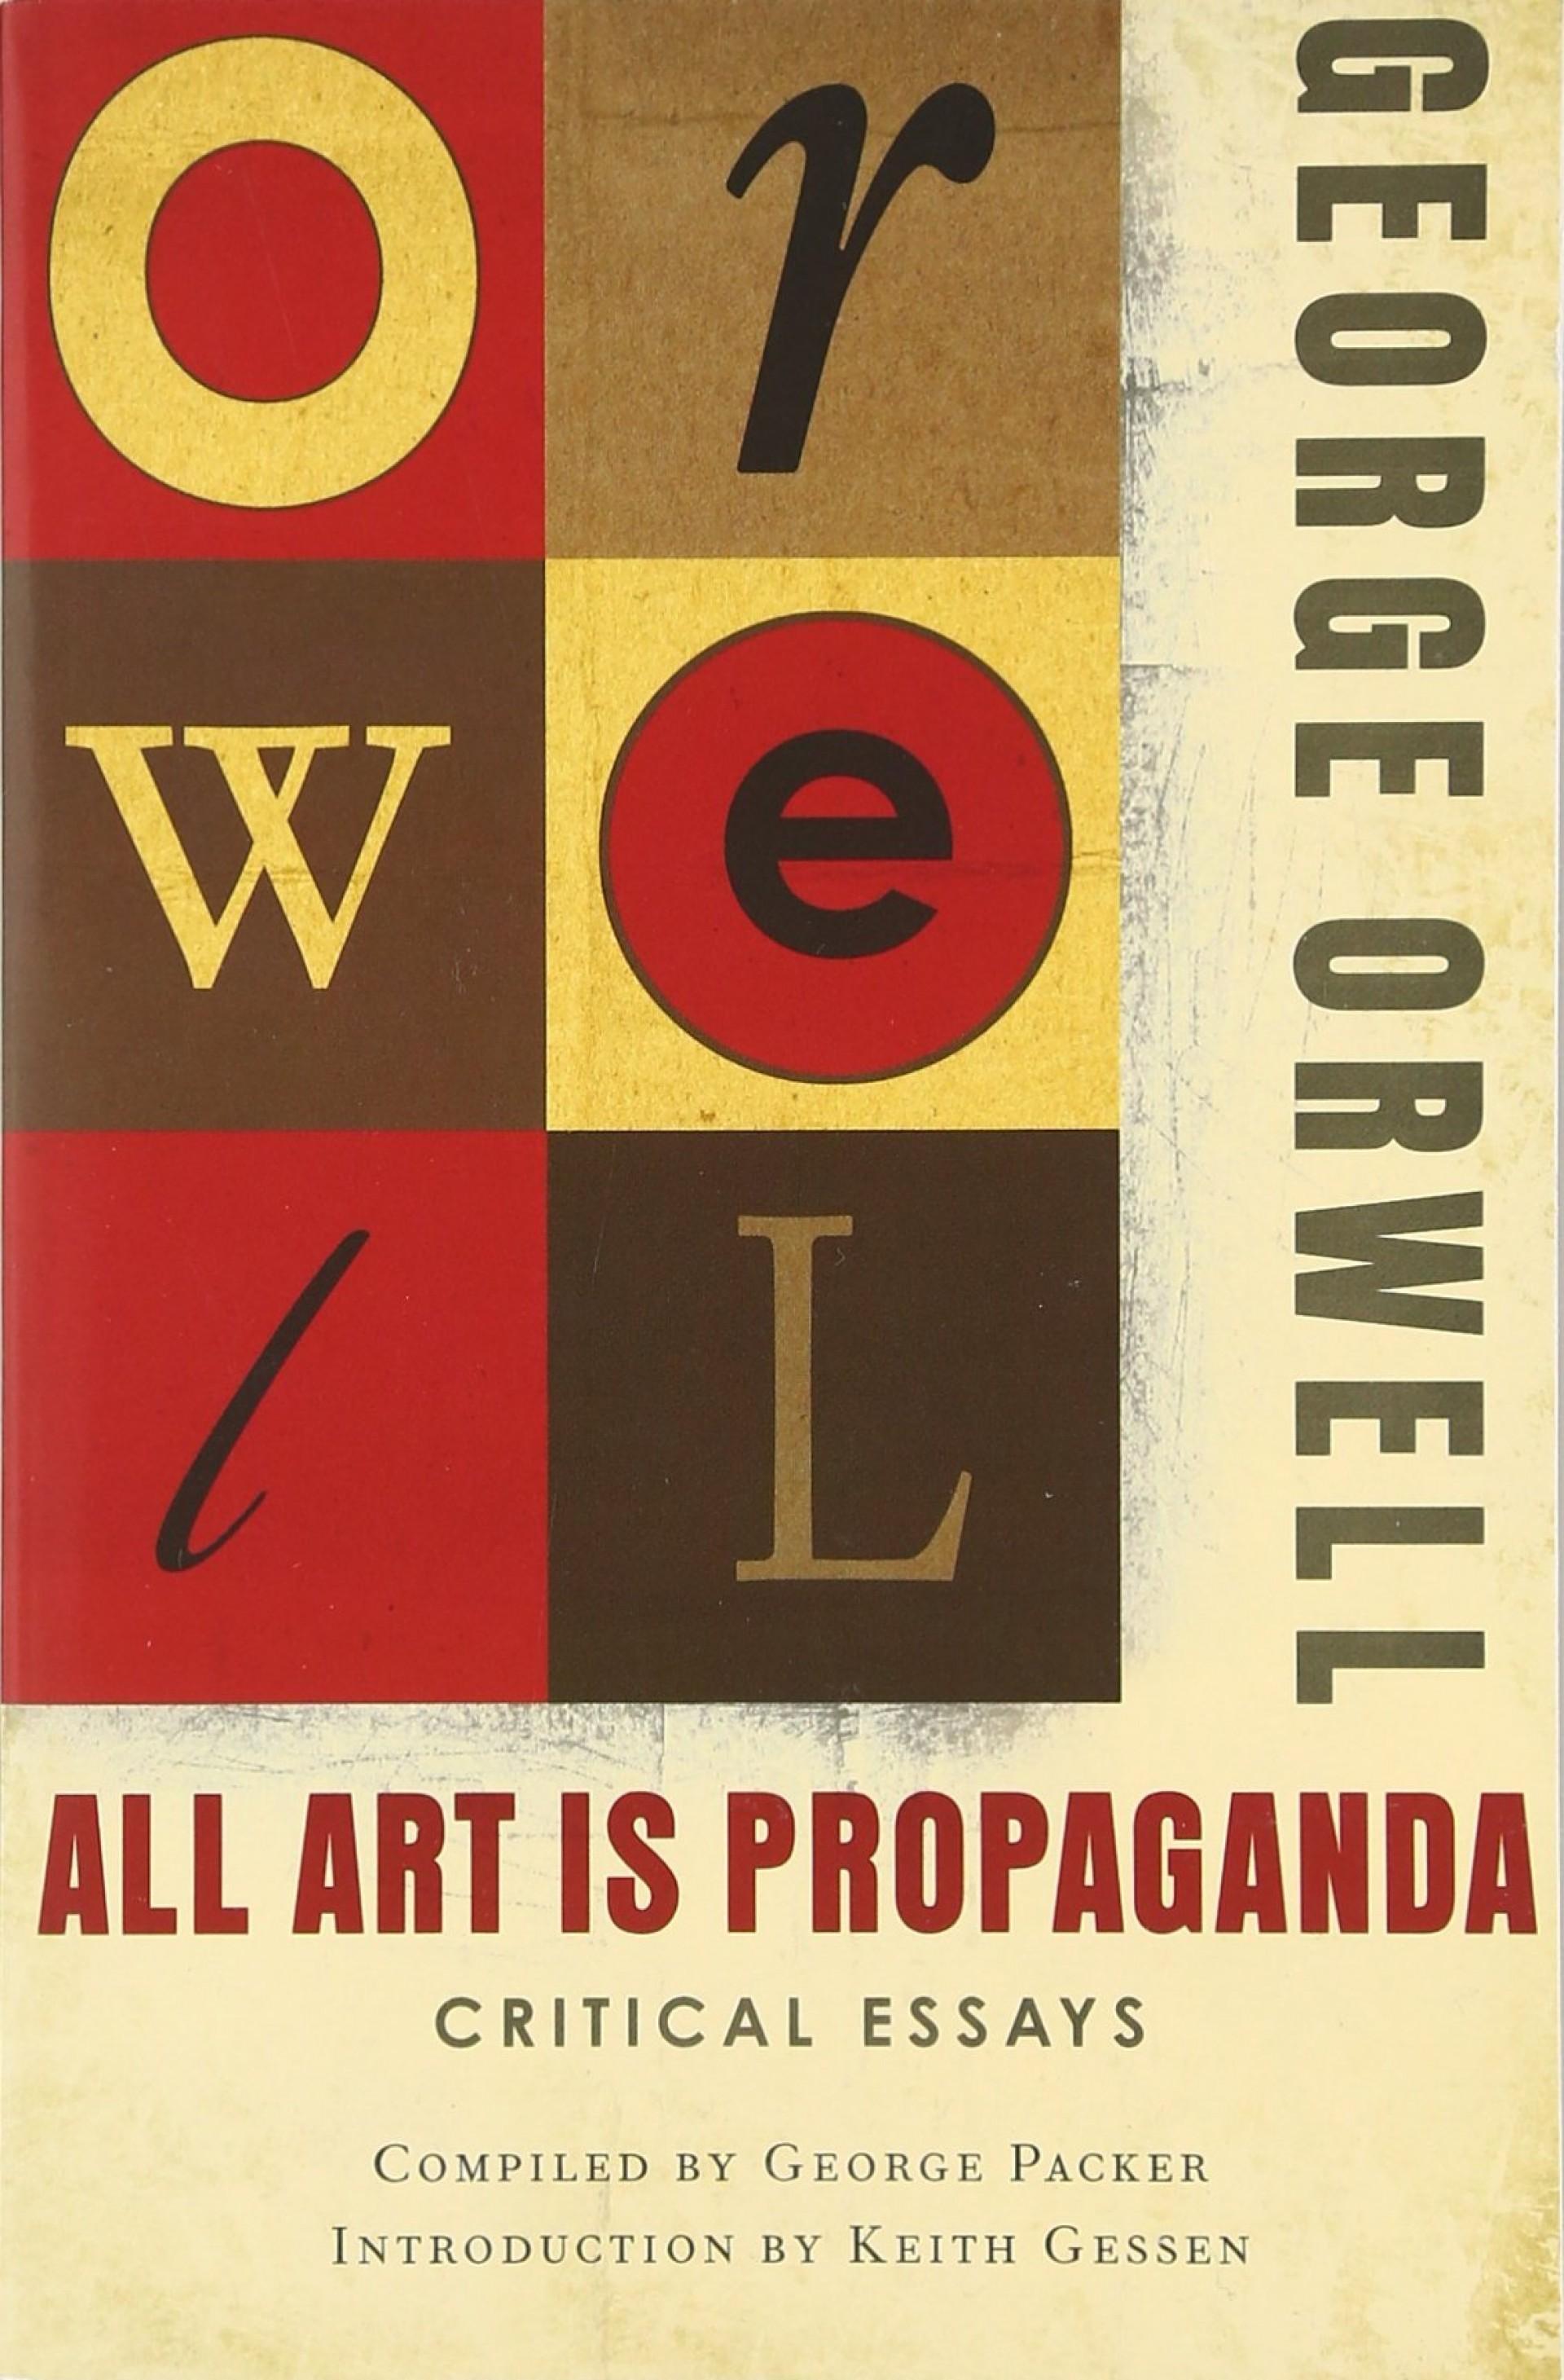 004 Essay Example 81lxm2g02fl George Orwell Frightening Essays Everyman's Library Summary Bookshop Memories 1920